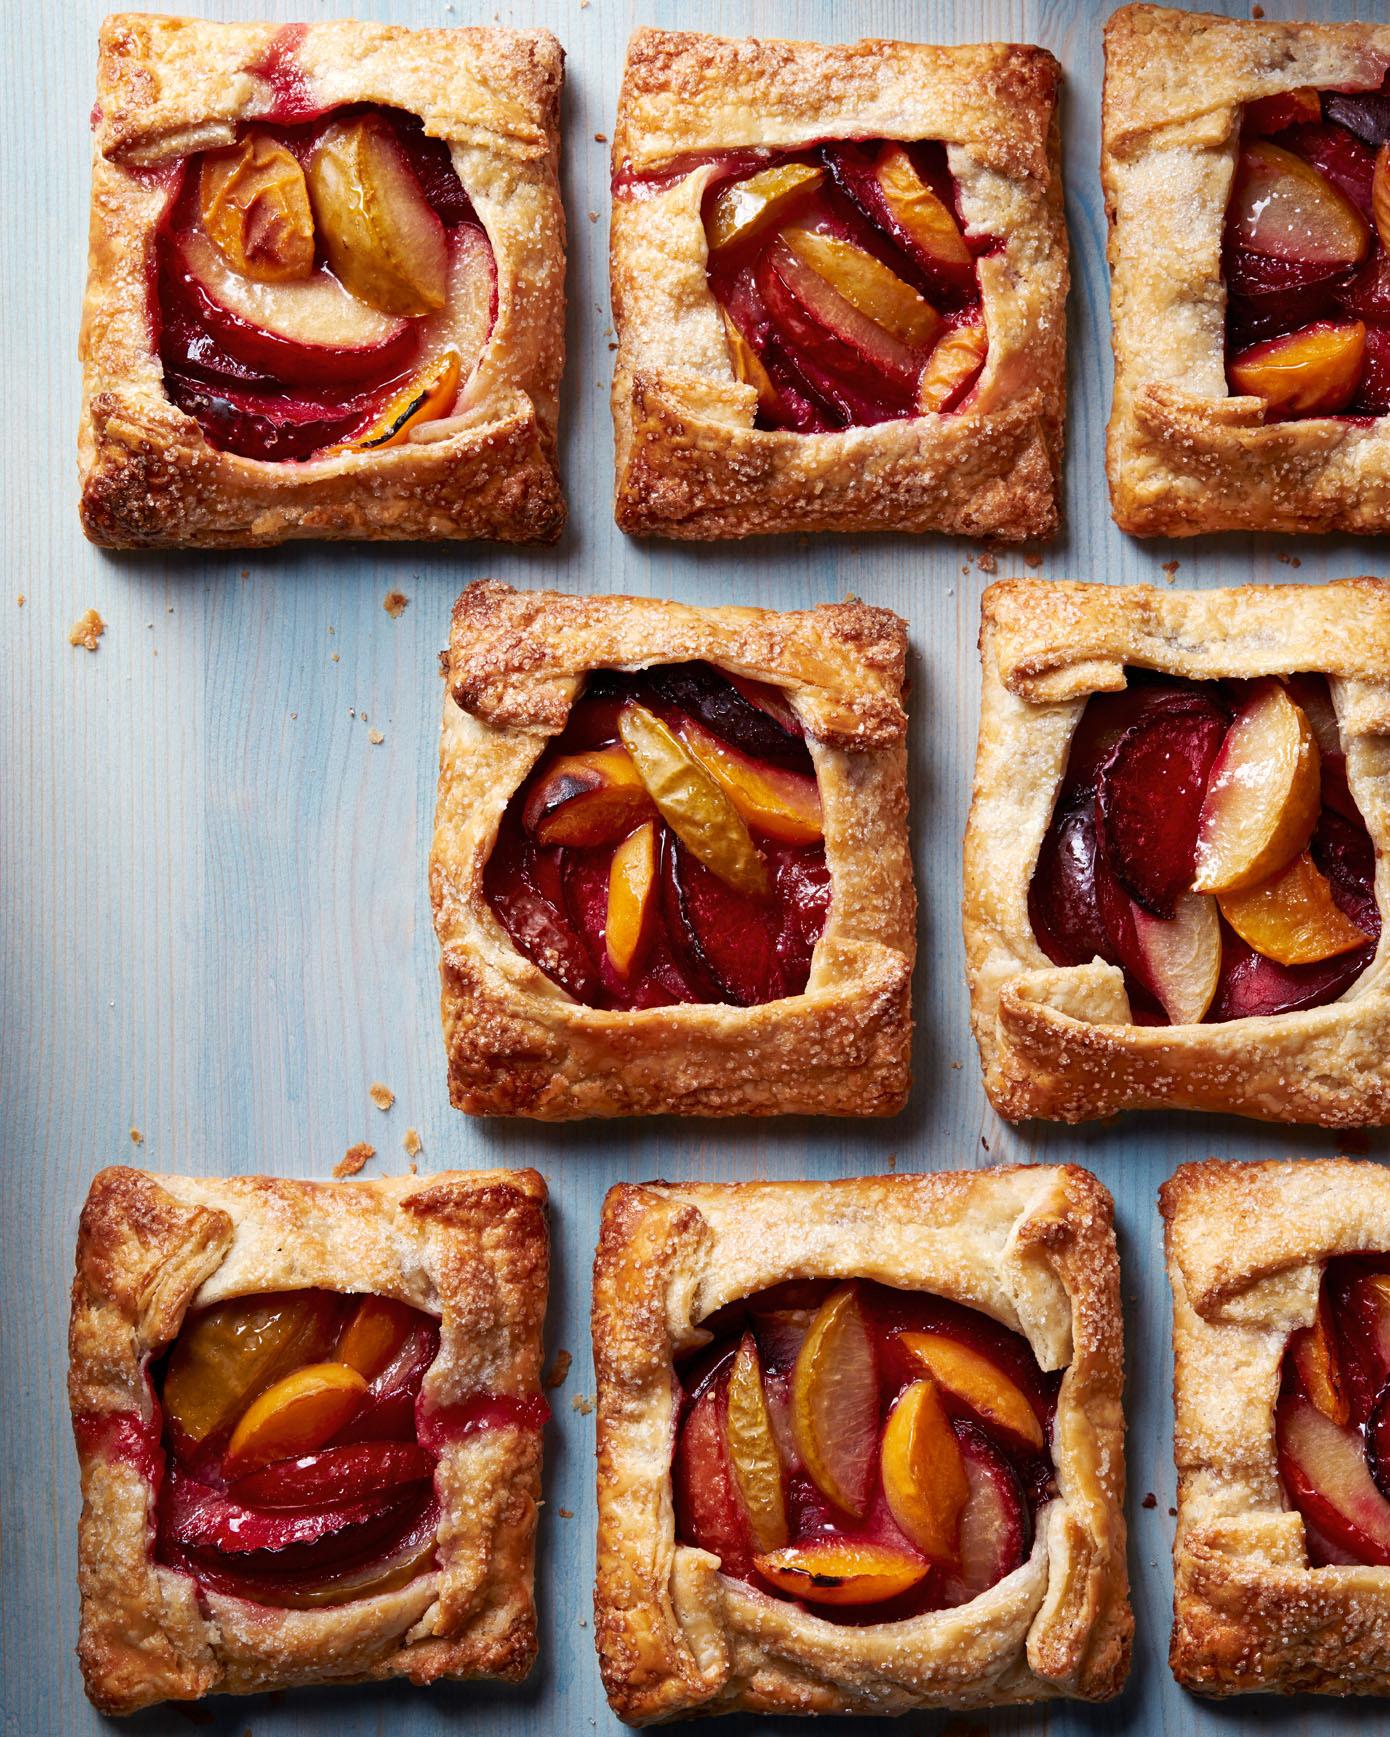 fall-dessert-plum-and-almond-galette-4208-hero-d113106.jpg